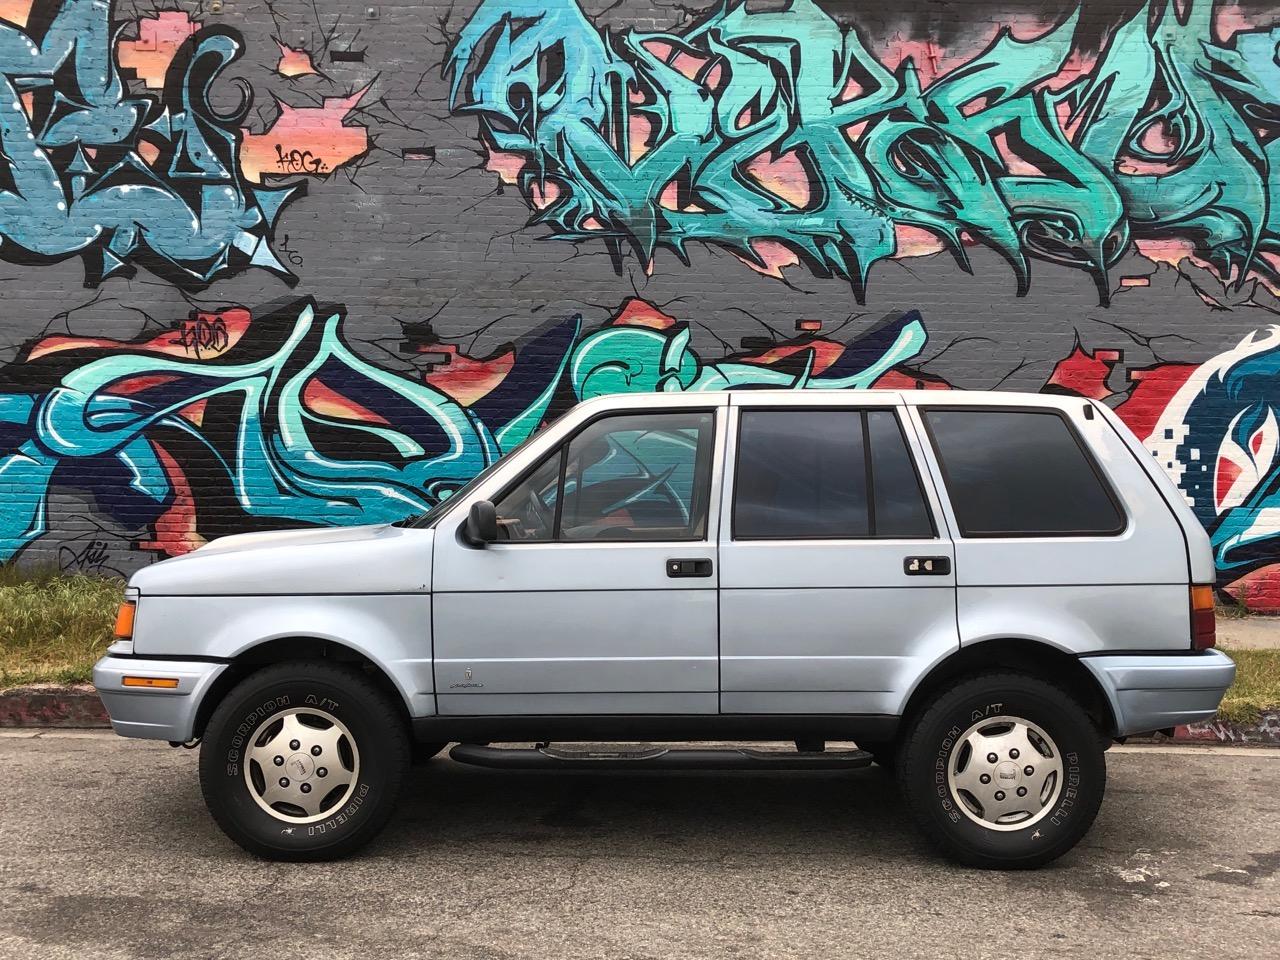 Used-1989-Laforza-50-4X4